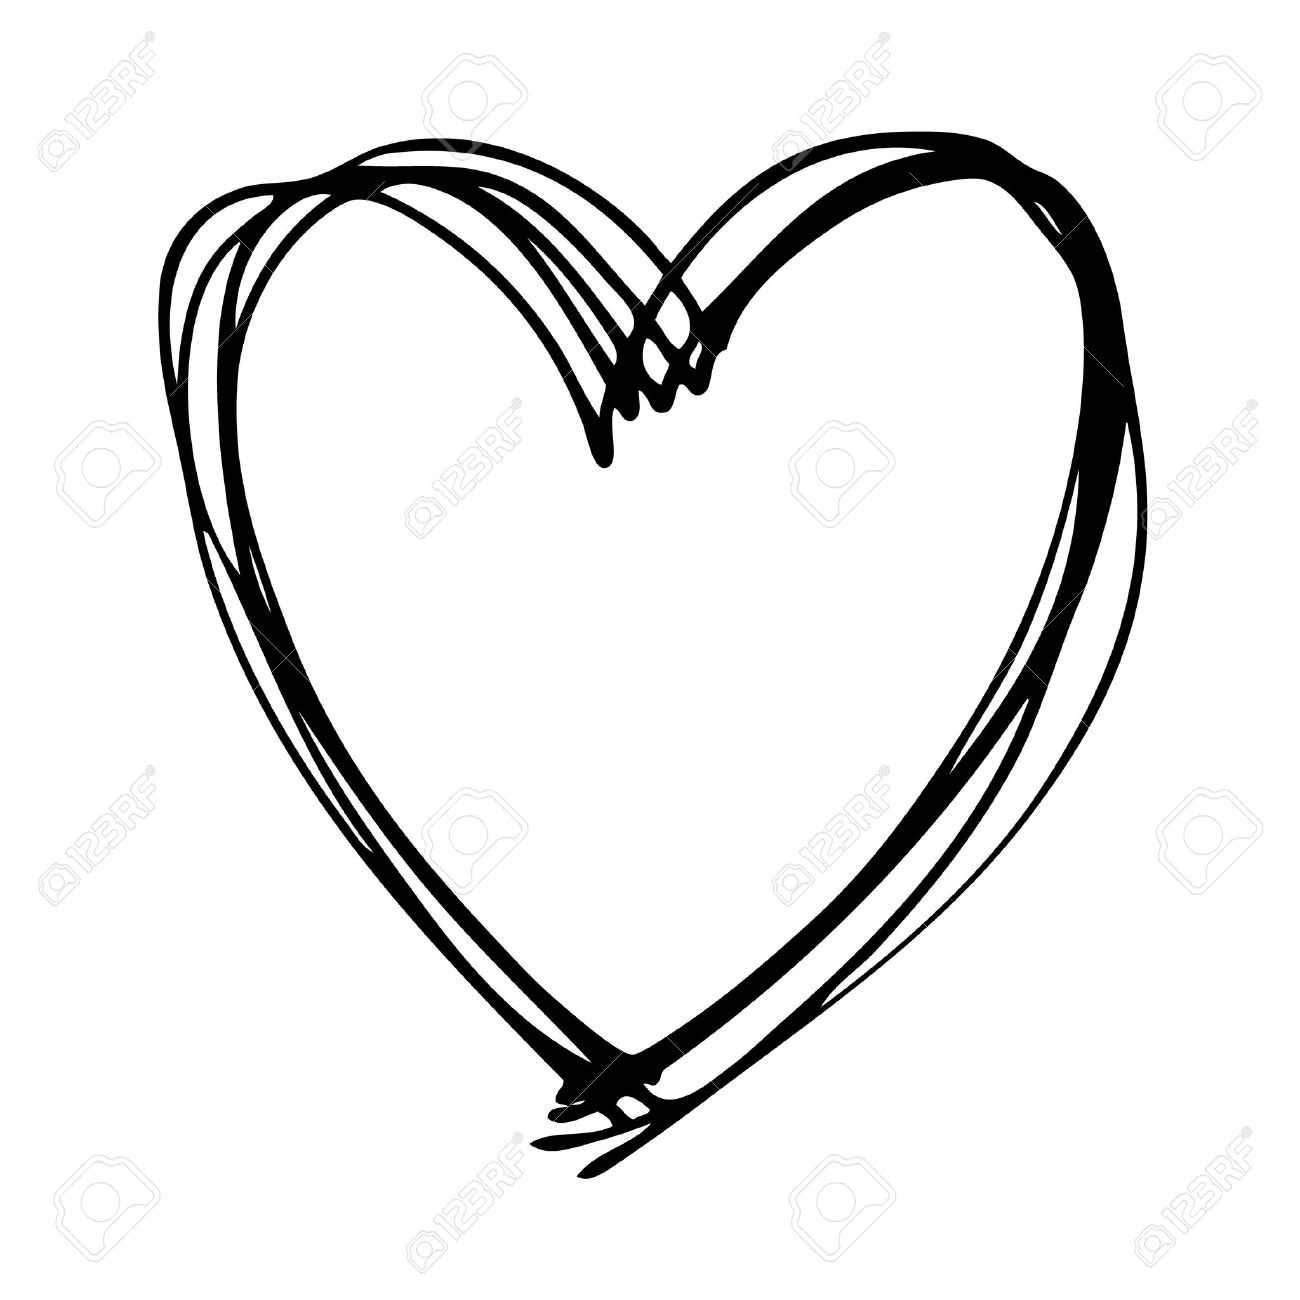 Heart Clipart Transparent